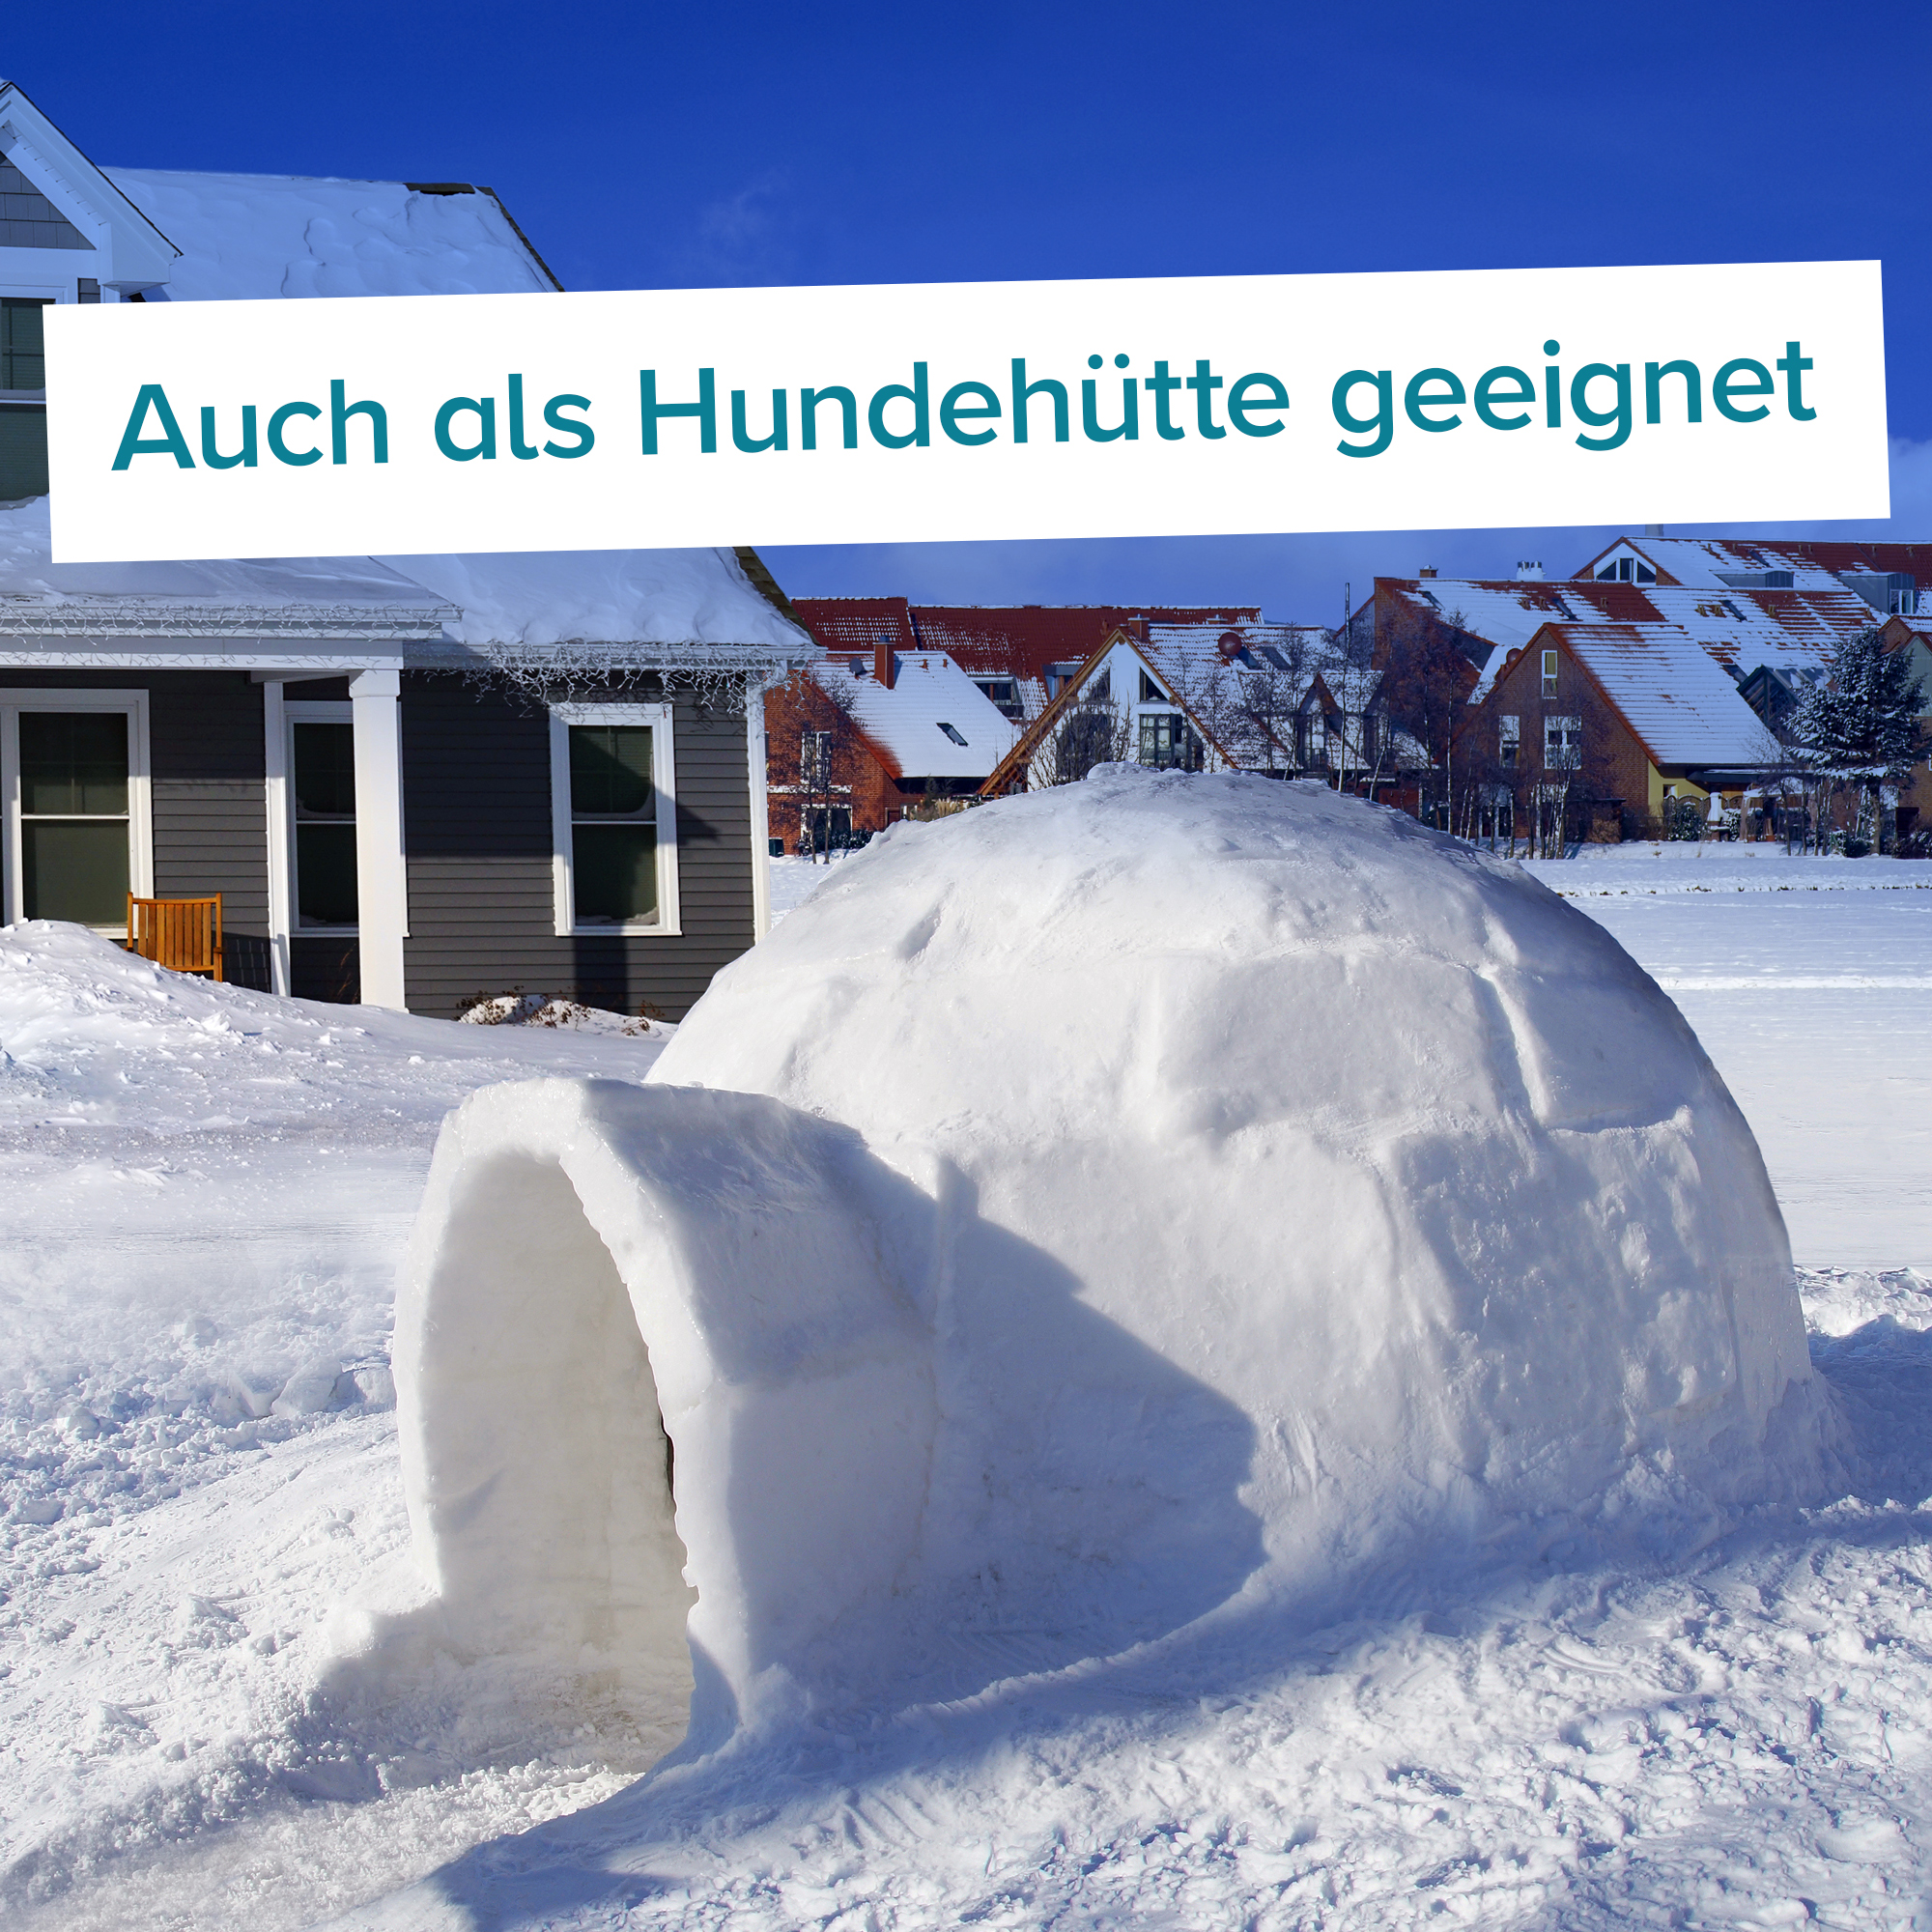 Iglu Bausatz für zuhause - Igloo yourself - 7